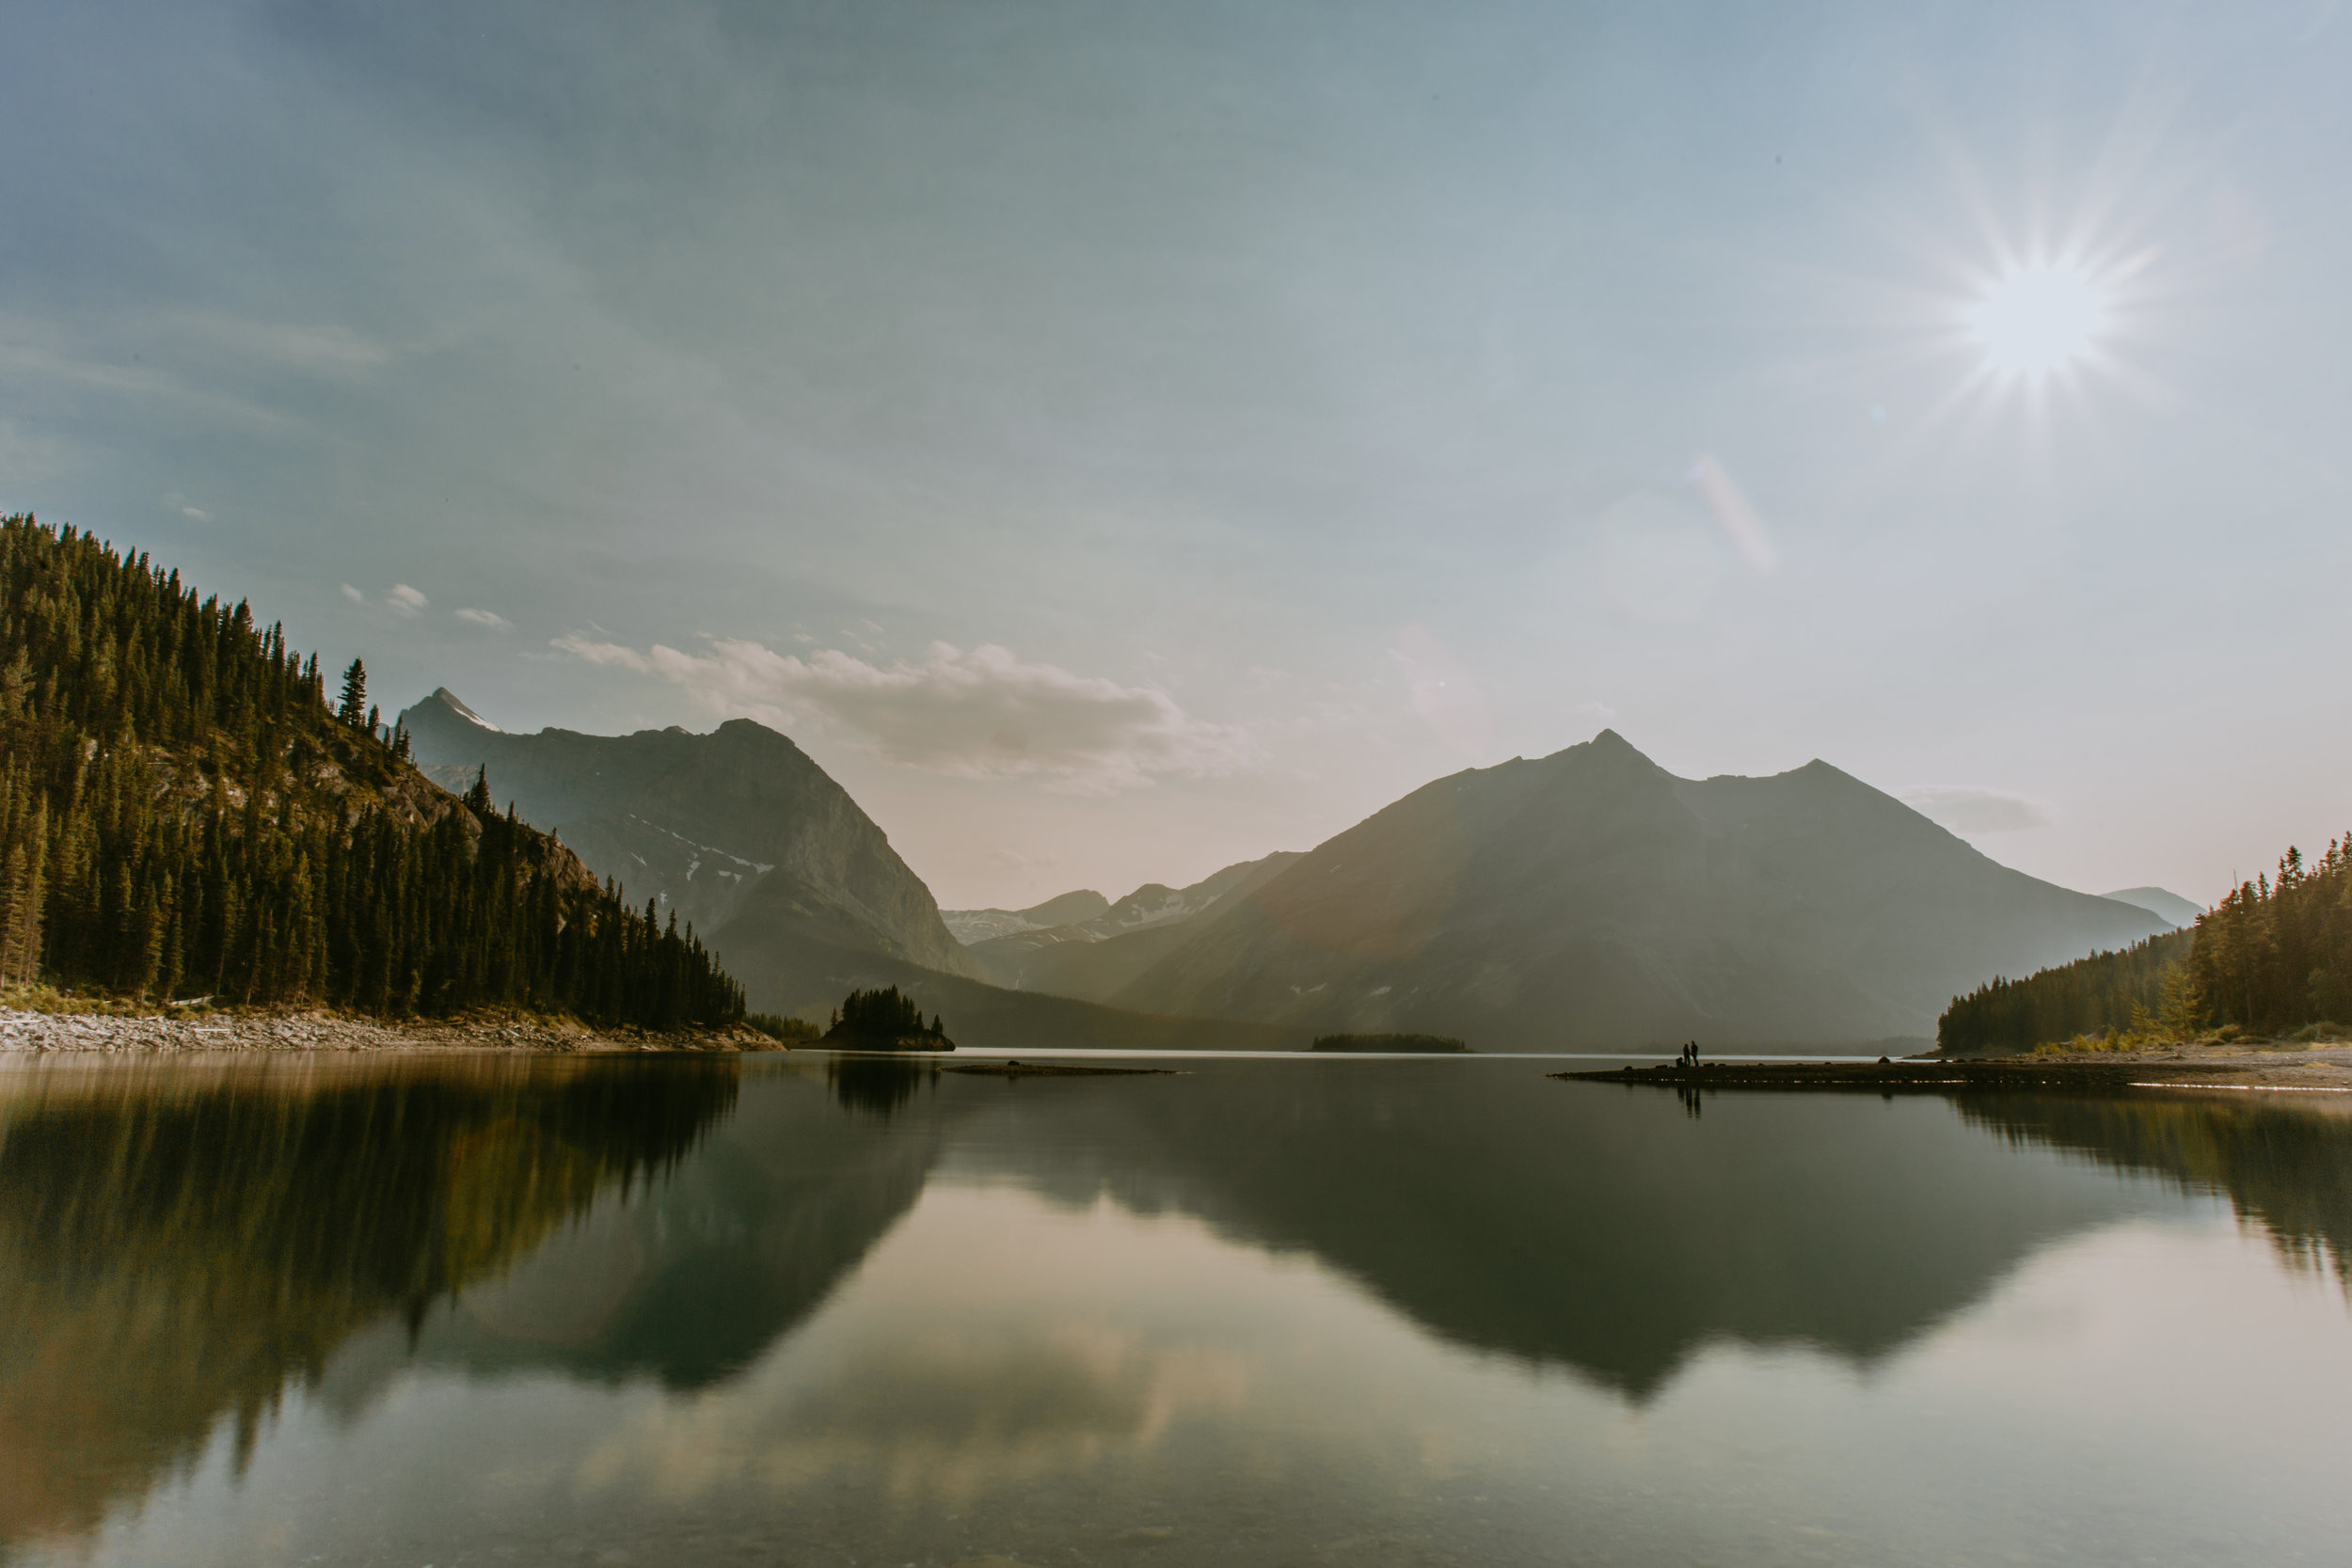 nicole-daacke-photography-banff-national-park-yoho-jasper-canada-parks-alberta-landscape-photographer-canadian-rockies-elopement-photographer-kananaskis-landscape-photos-4653.JPG